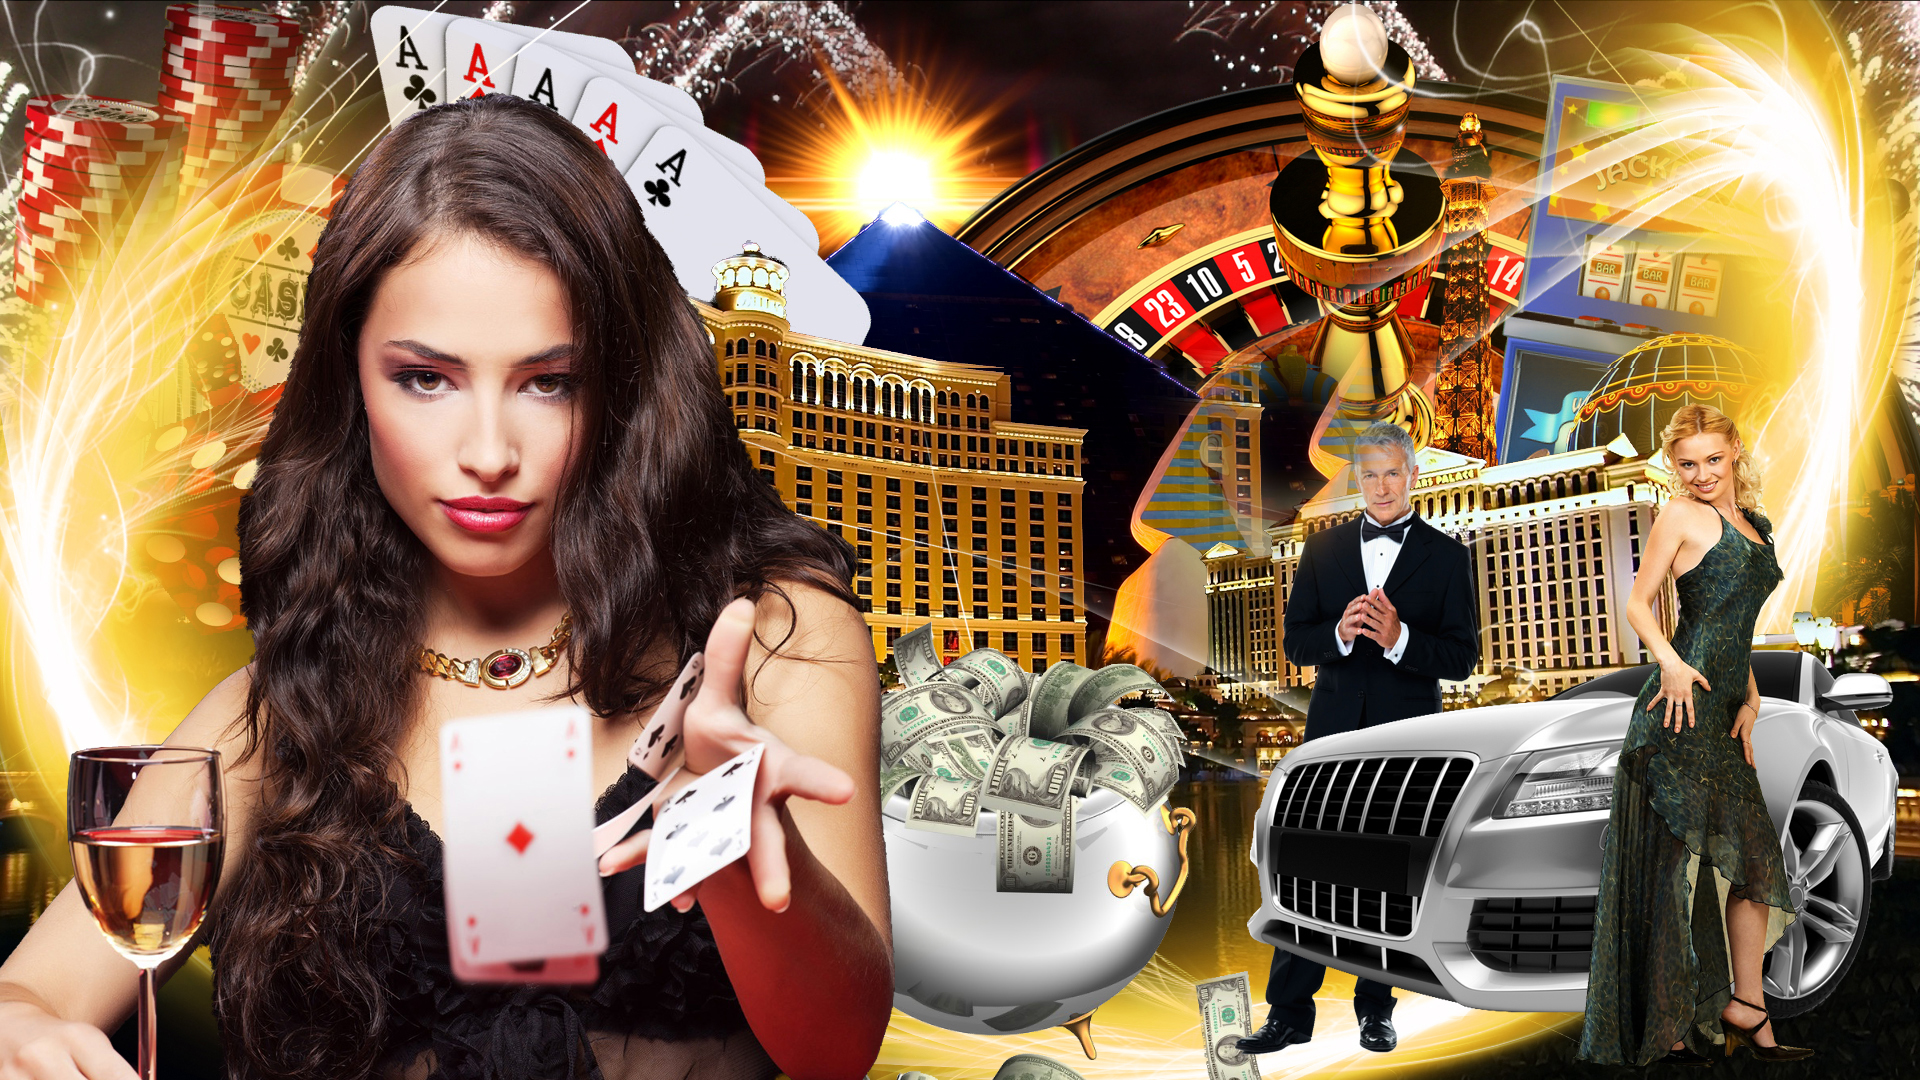 Thailand, Indonesia & Korean -900 Unique PBN Posts, UFAbet, Casino, Poker, Gambling, Betting Sites